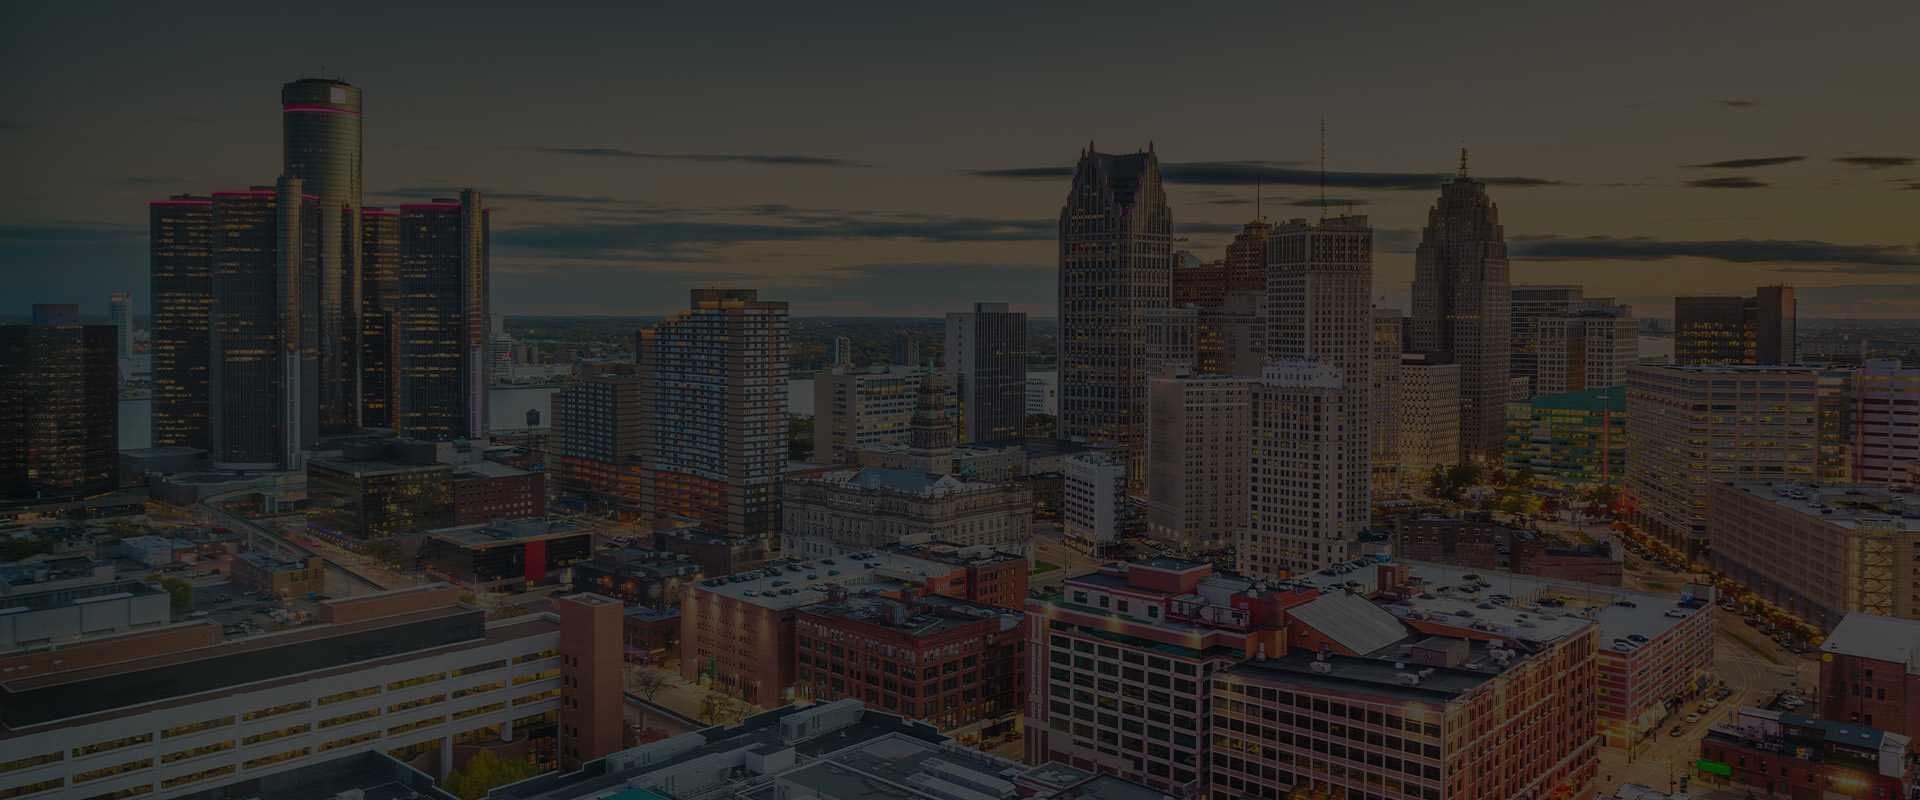 Business Brokers in Metro Detroit